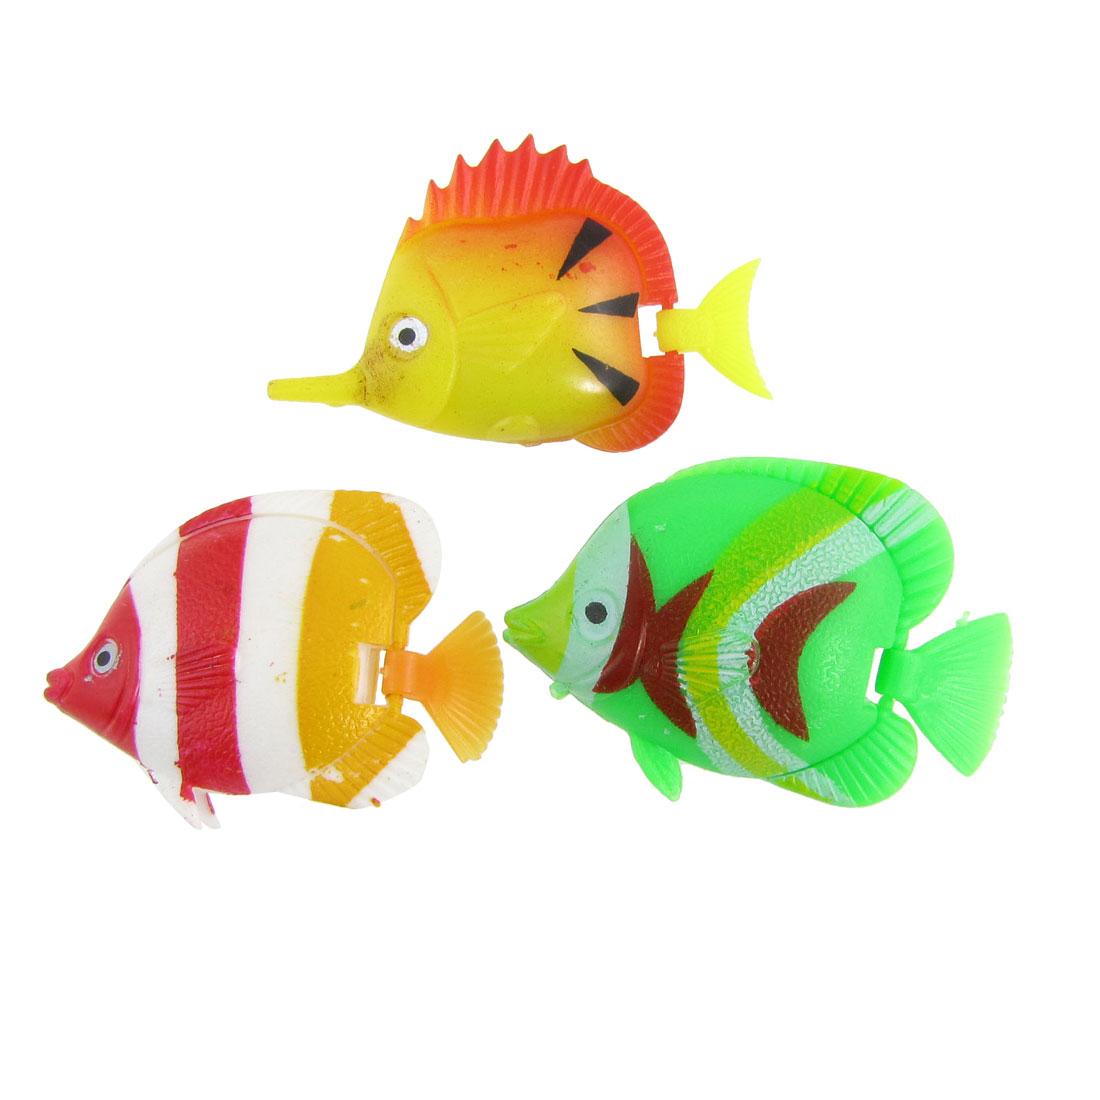 3 Pcs Colorful Plastic Tropical Fish Decor for Aquarium